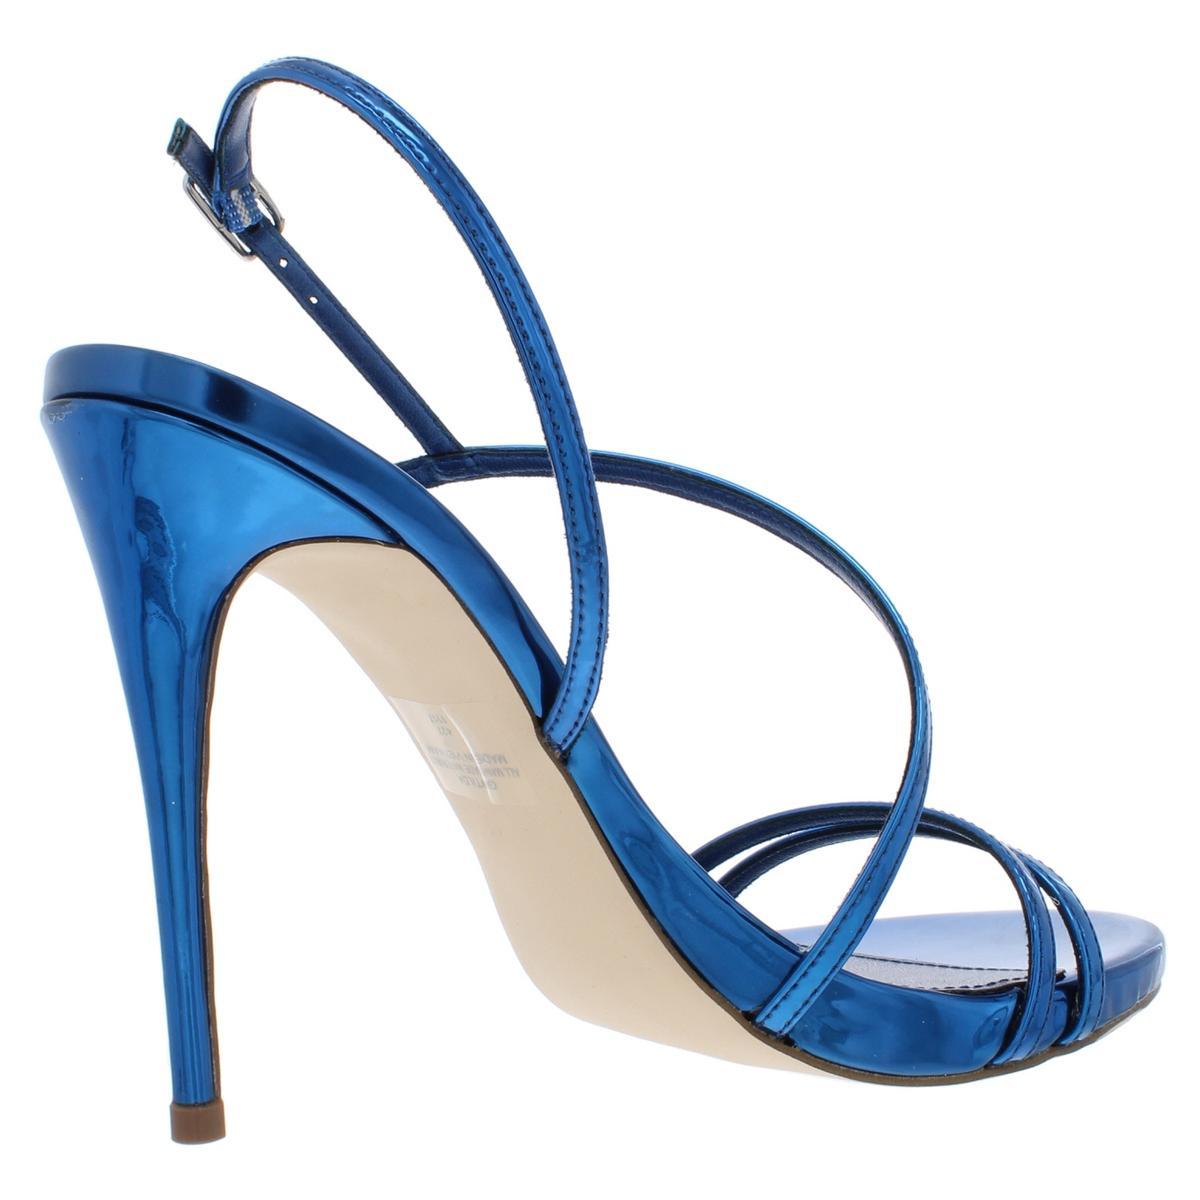 Guess-Womens-Tilda-Strappy-Stiletto-Open-Toe-Dress-Sandals-Shoes-BHFO-6195 thumbnail 6